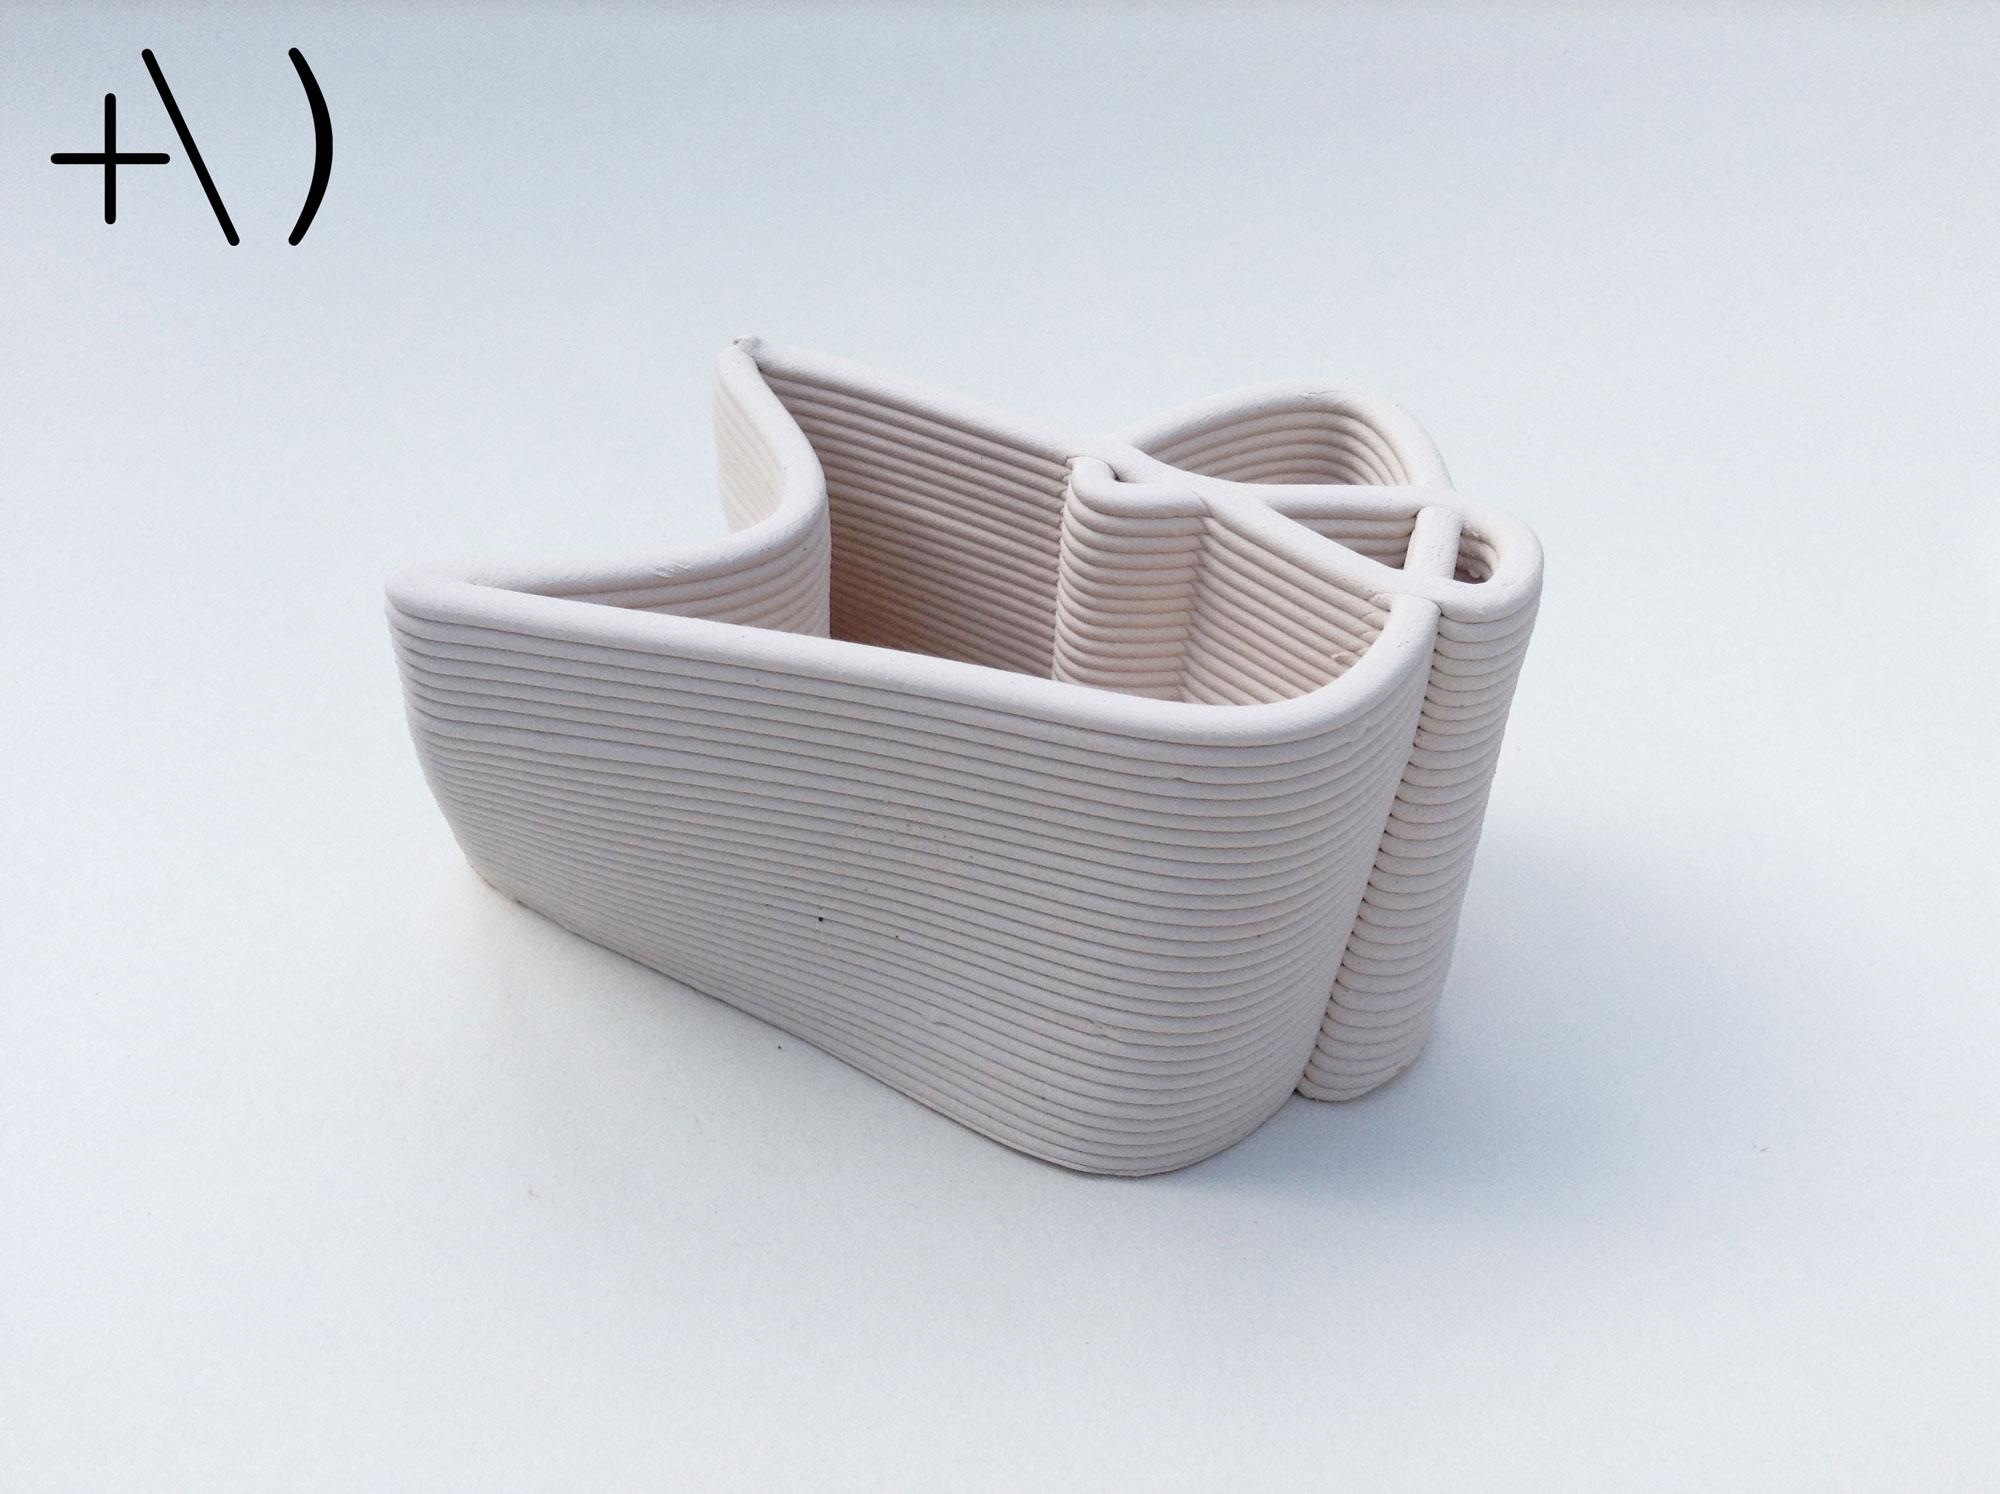 computational clay design intersezione